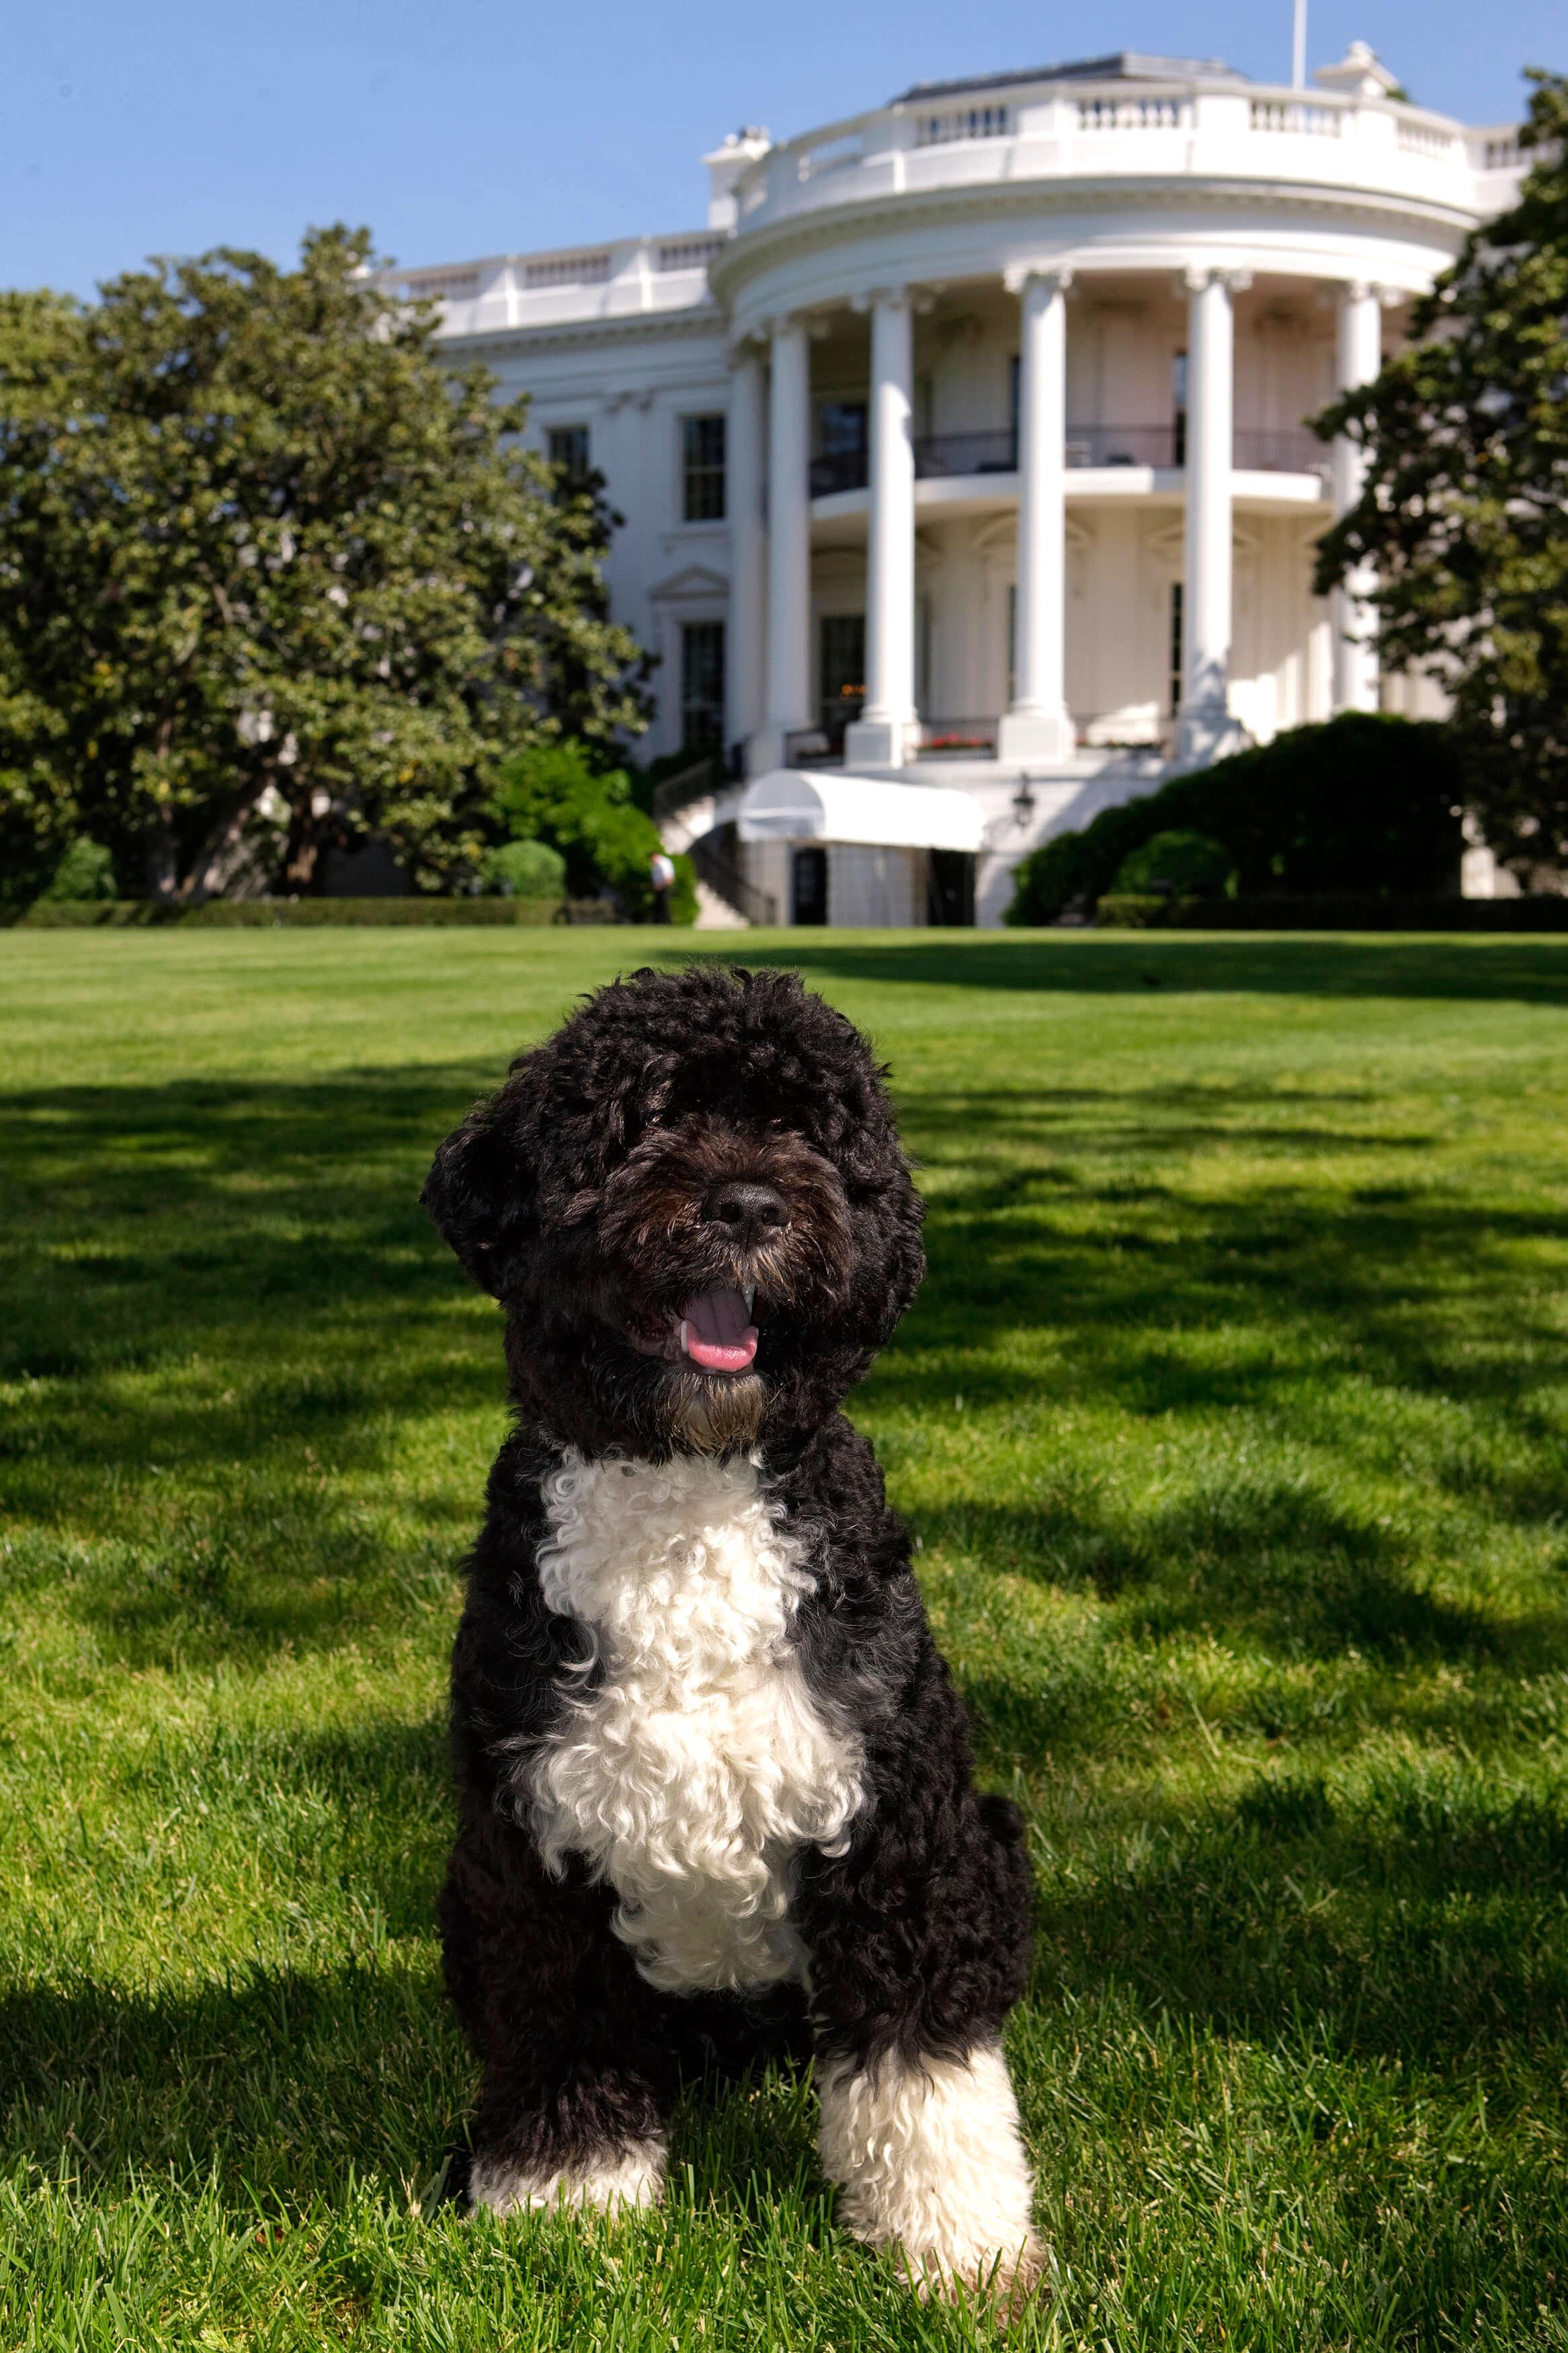 Bo Obama at the White House